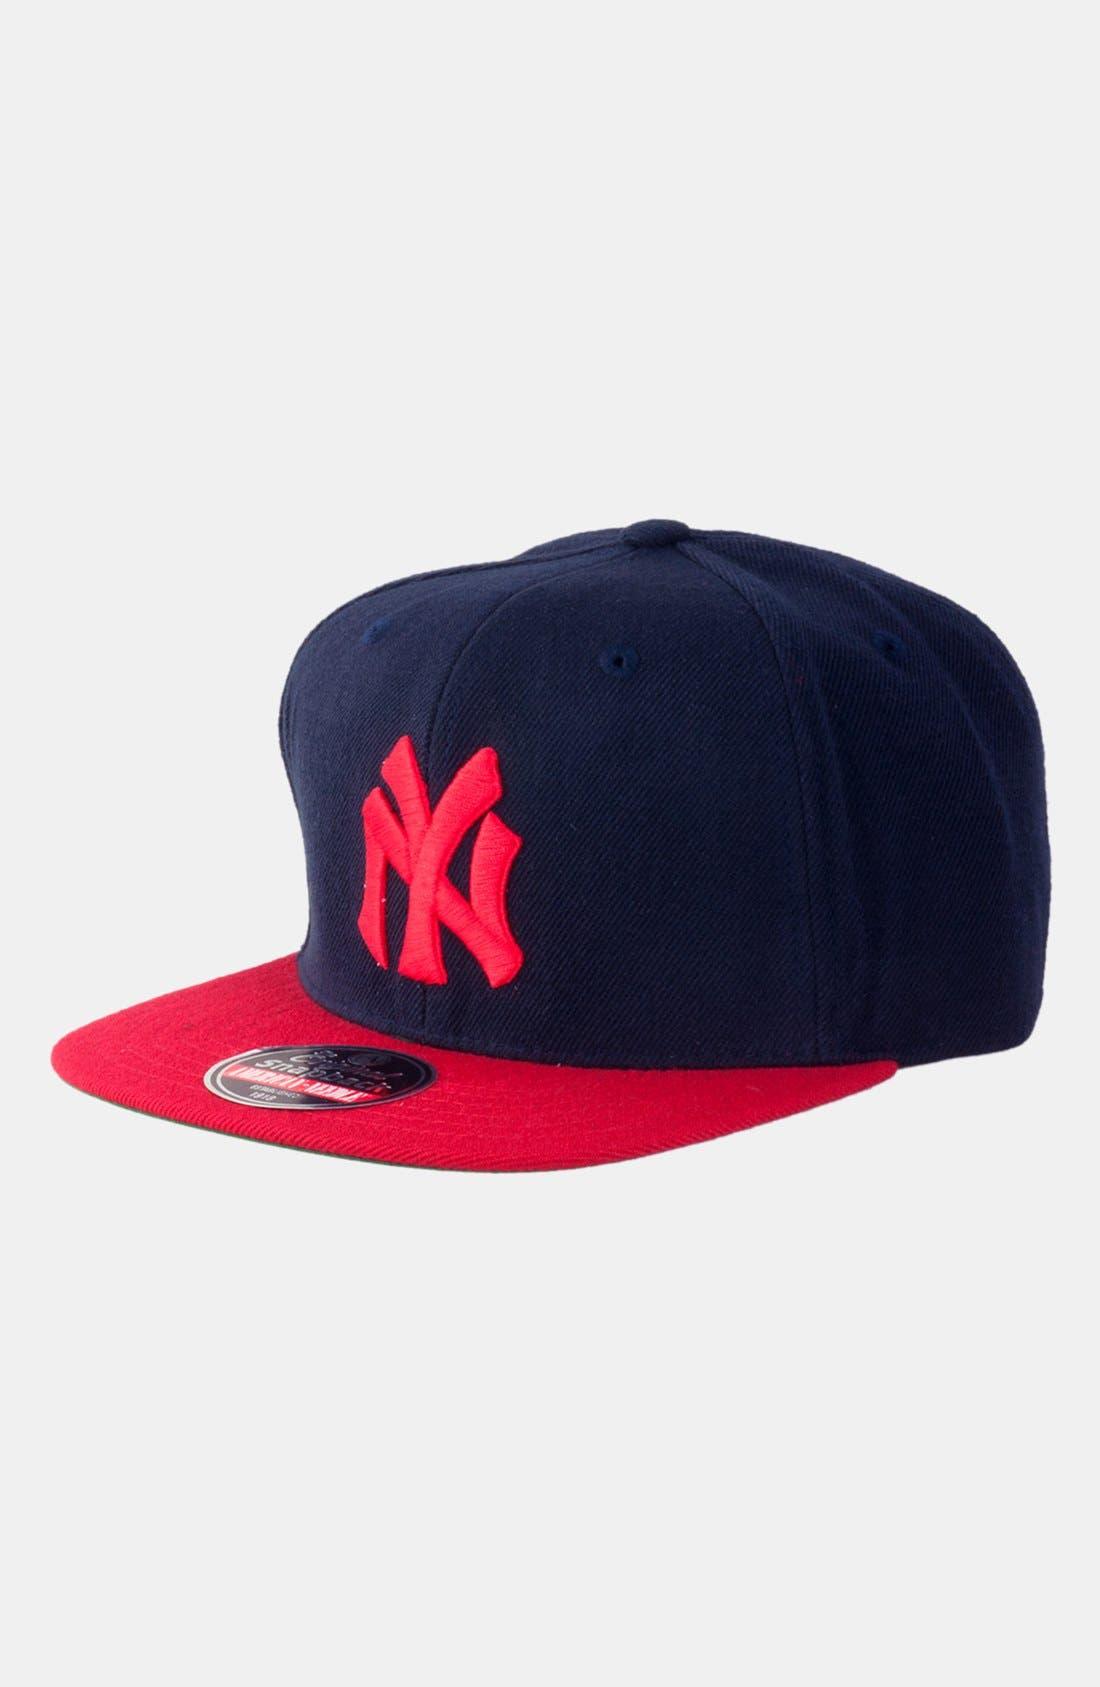 Alternate Image 1 Selected - American Needle 'New York Yankees 1910 - 400 Series' Snapback Baseball Cap